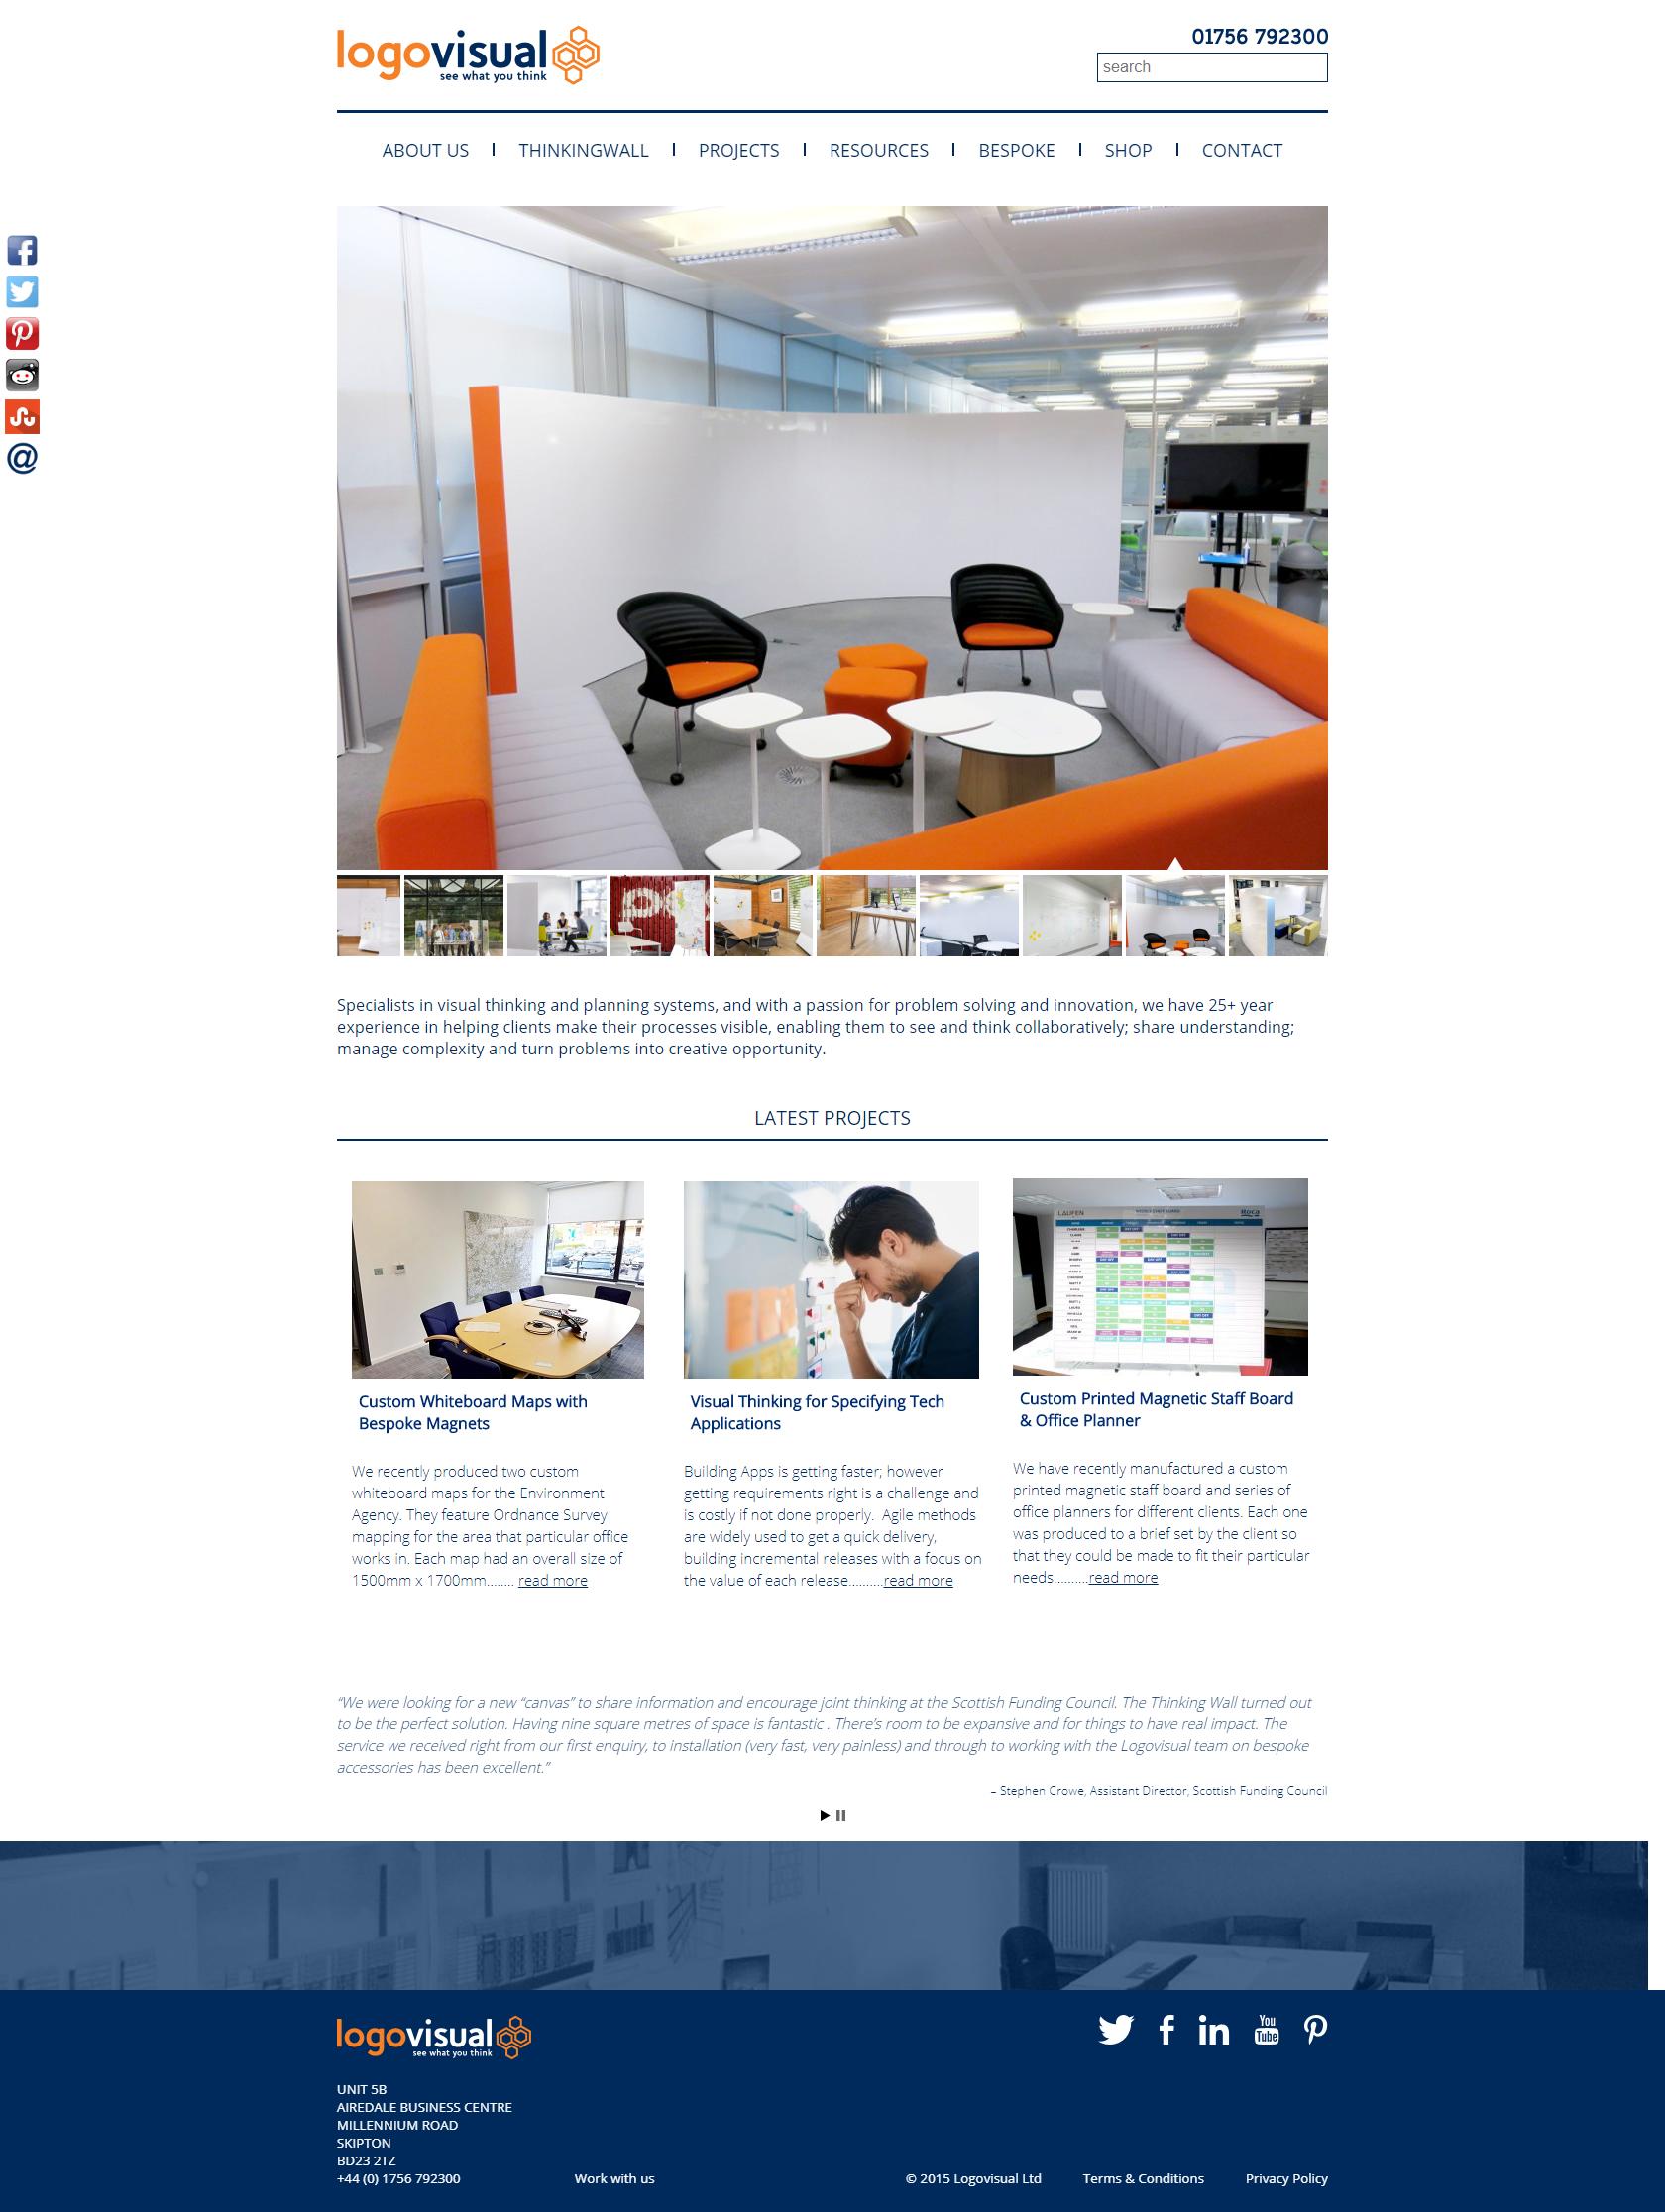 Case Study: WordPress Optimization for LogoVisual featured image